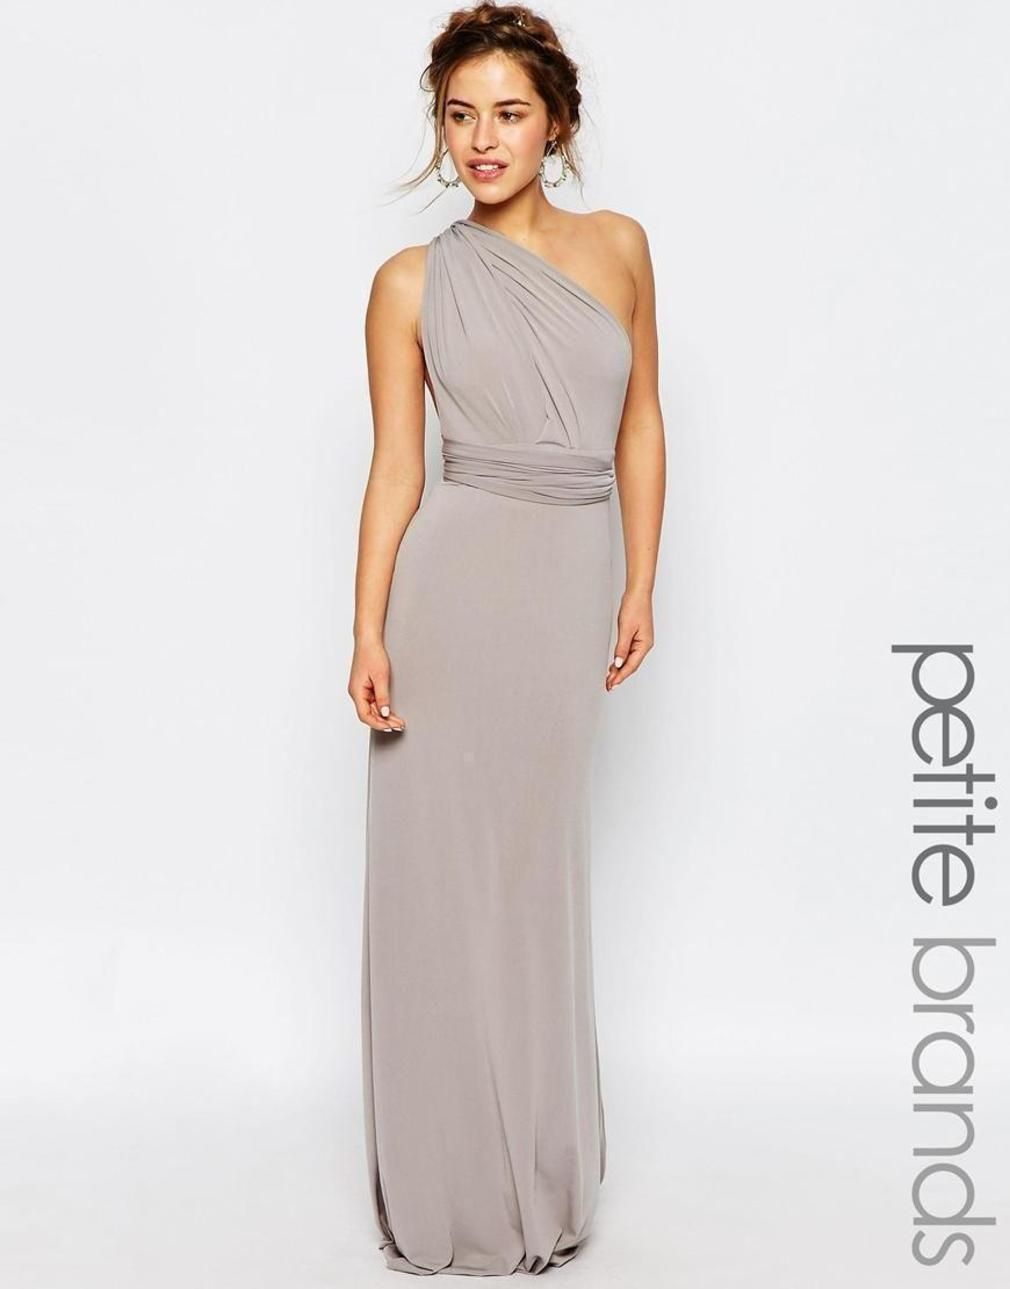 Petite WEDDING Multiway Fishtail Maxi Dress http://picvpic.com/women ...